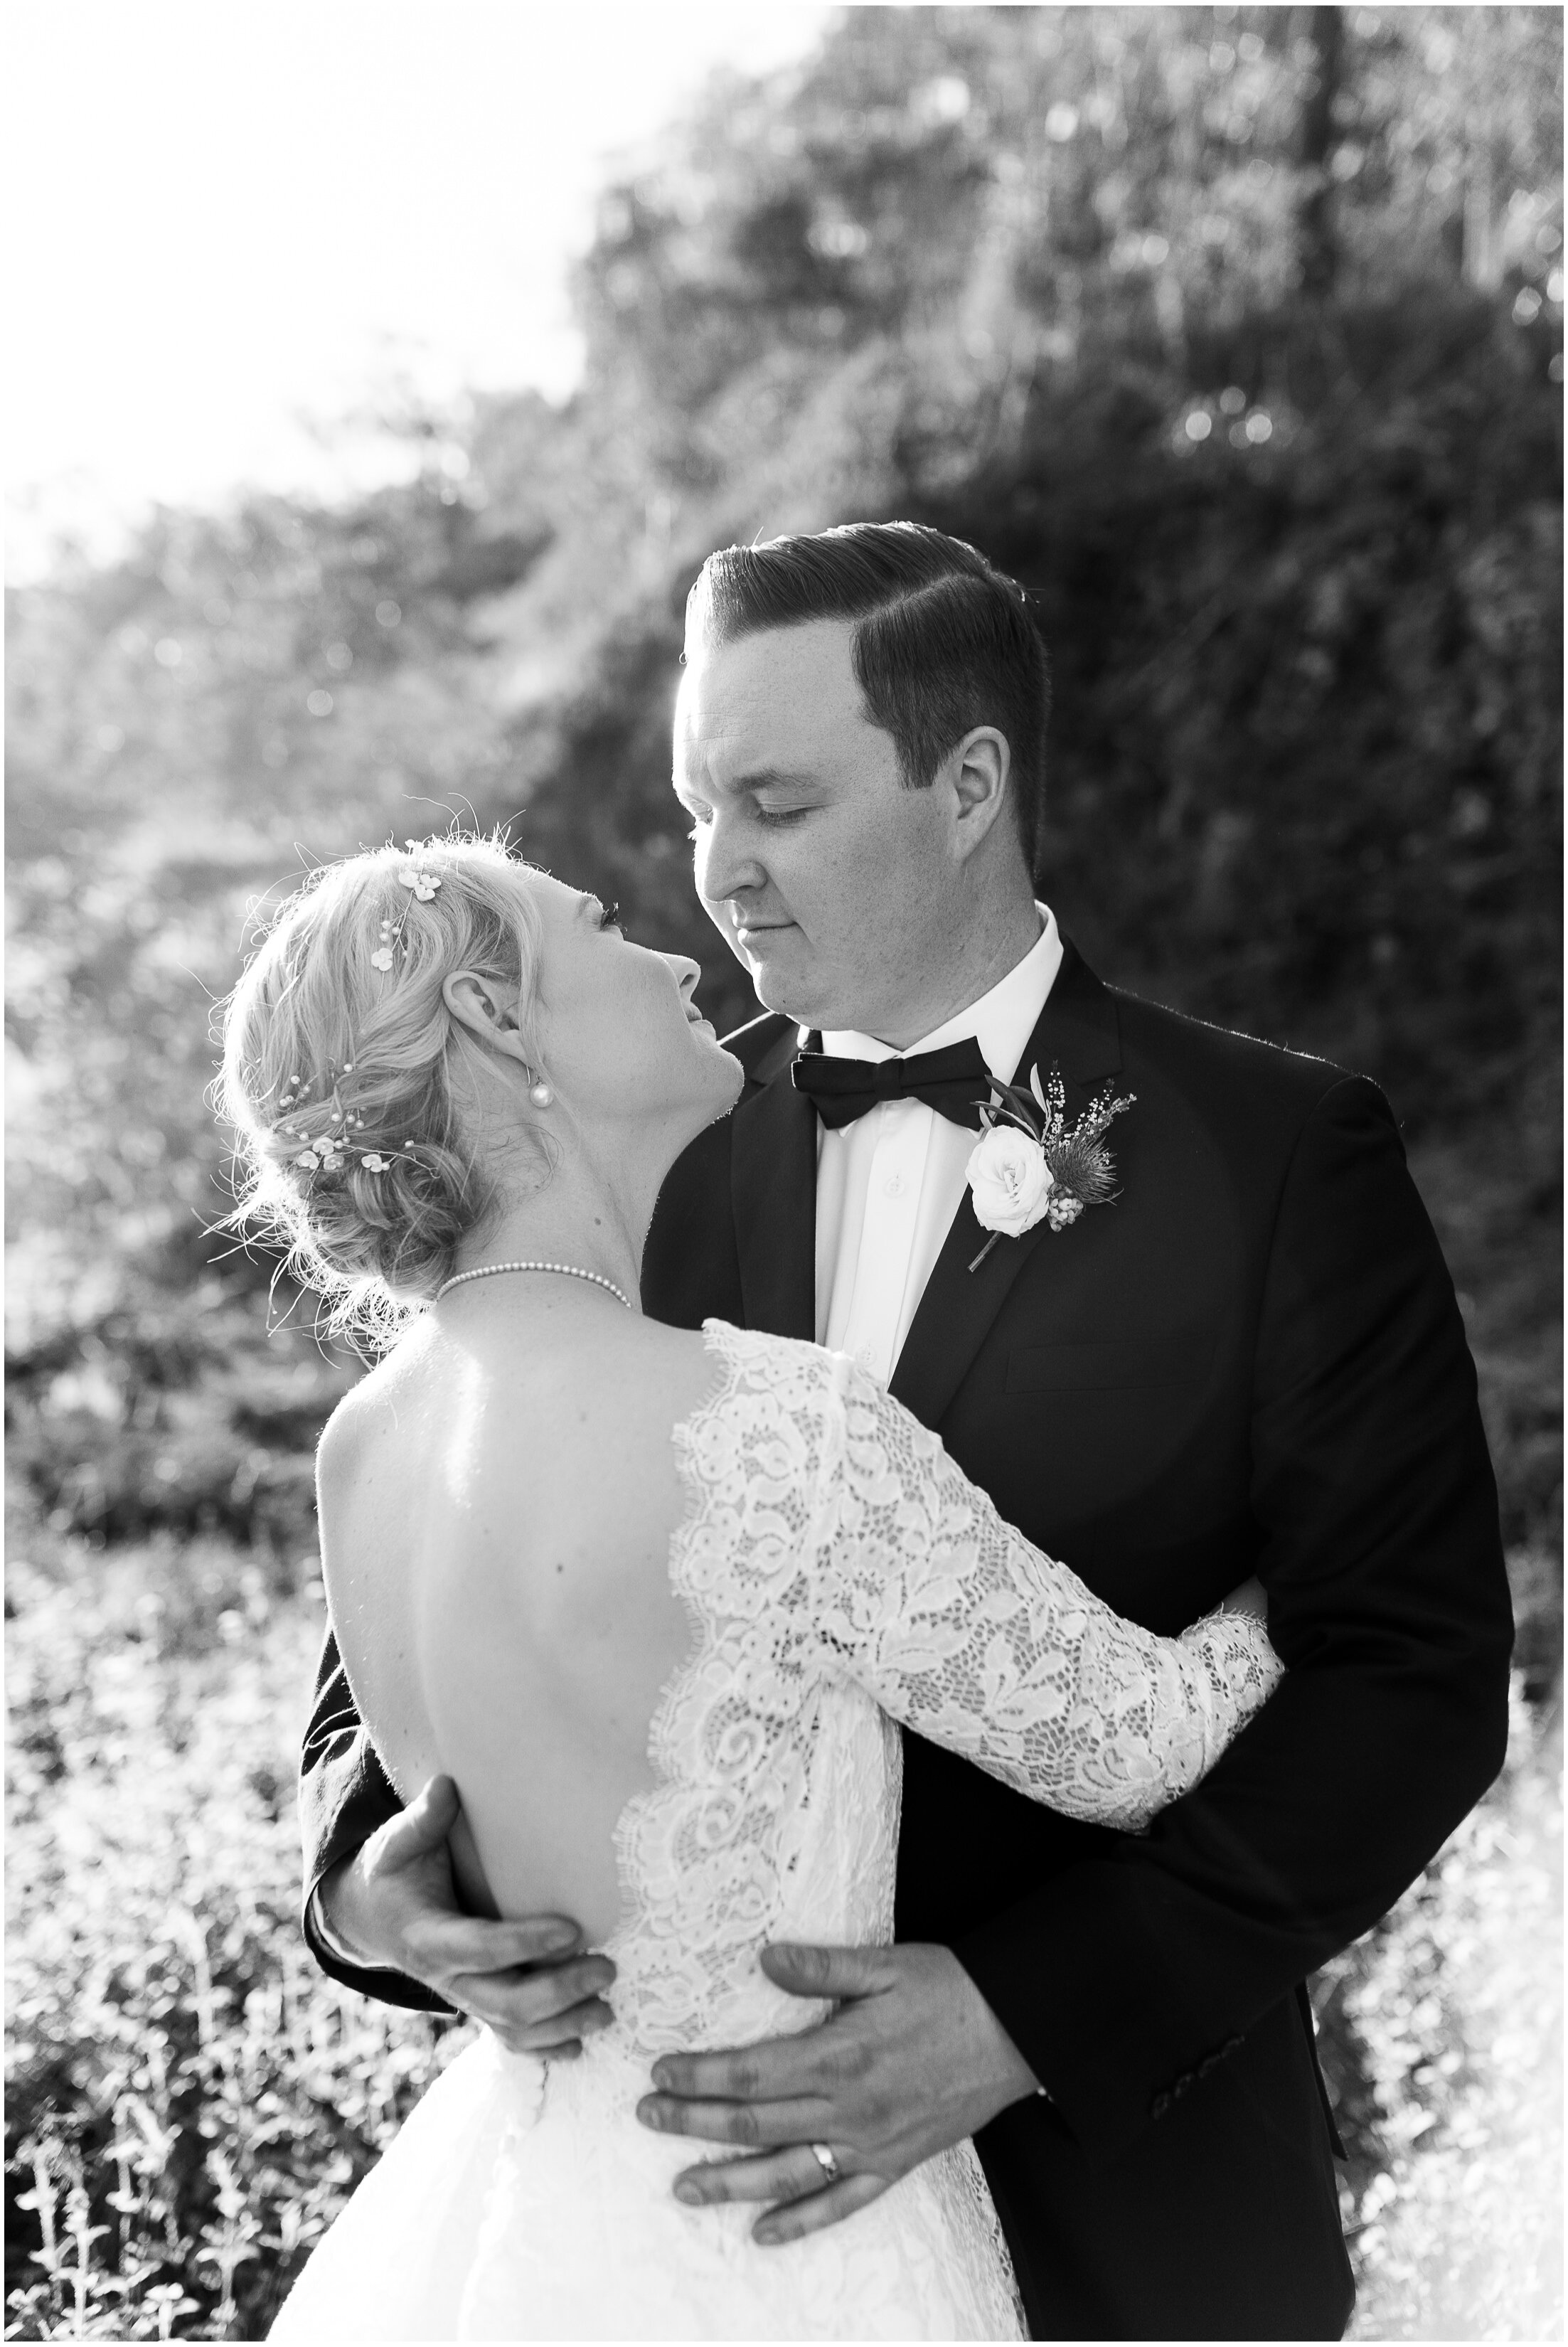 brisbane-fine-art-wedding-photographer-lauren-olivia-luxury-wedding-australia-29.jpg